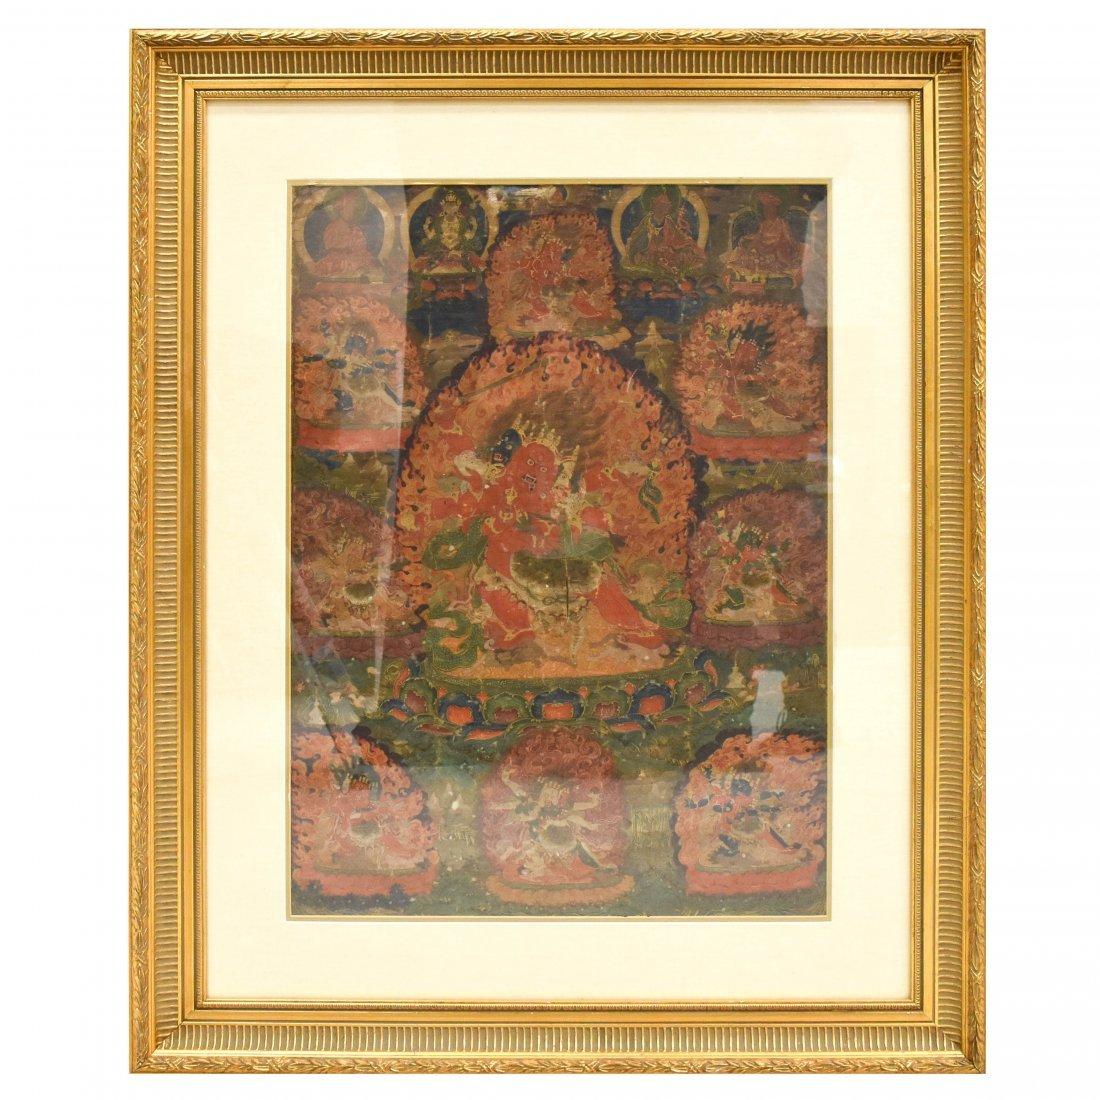 A TIBETAN BARDO THANGKA OF SAMANTABHADRA